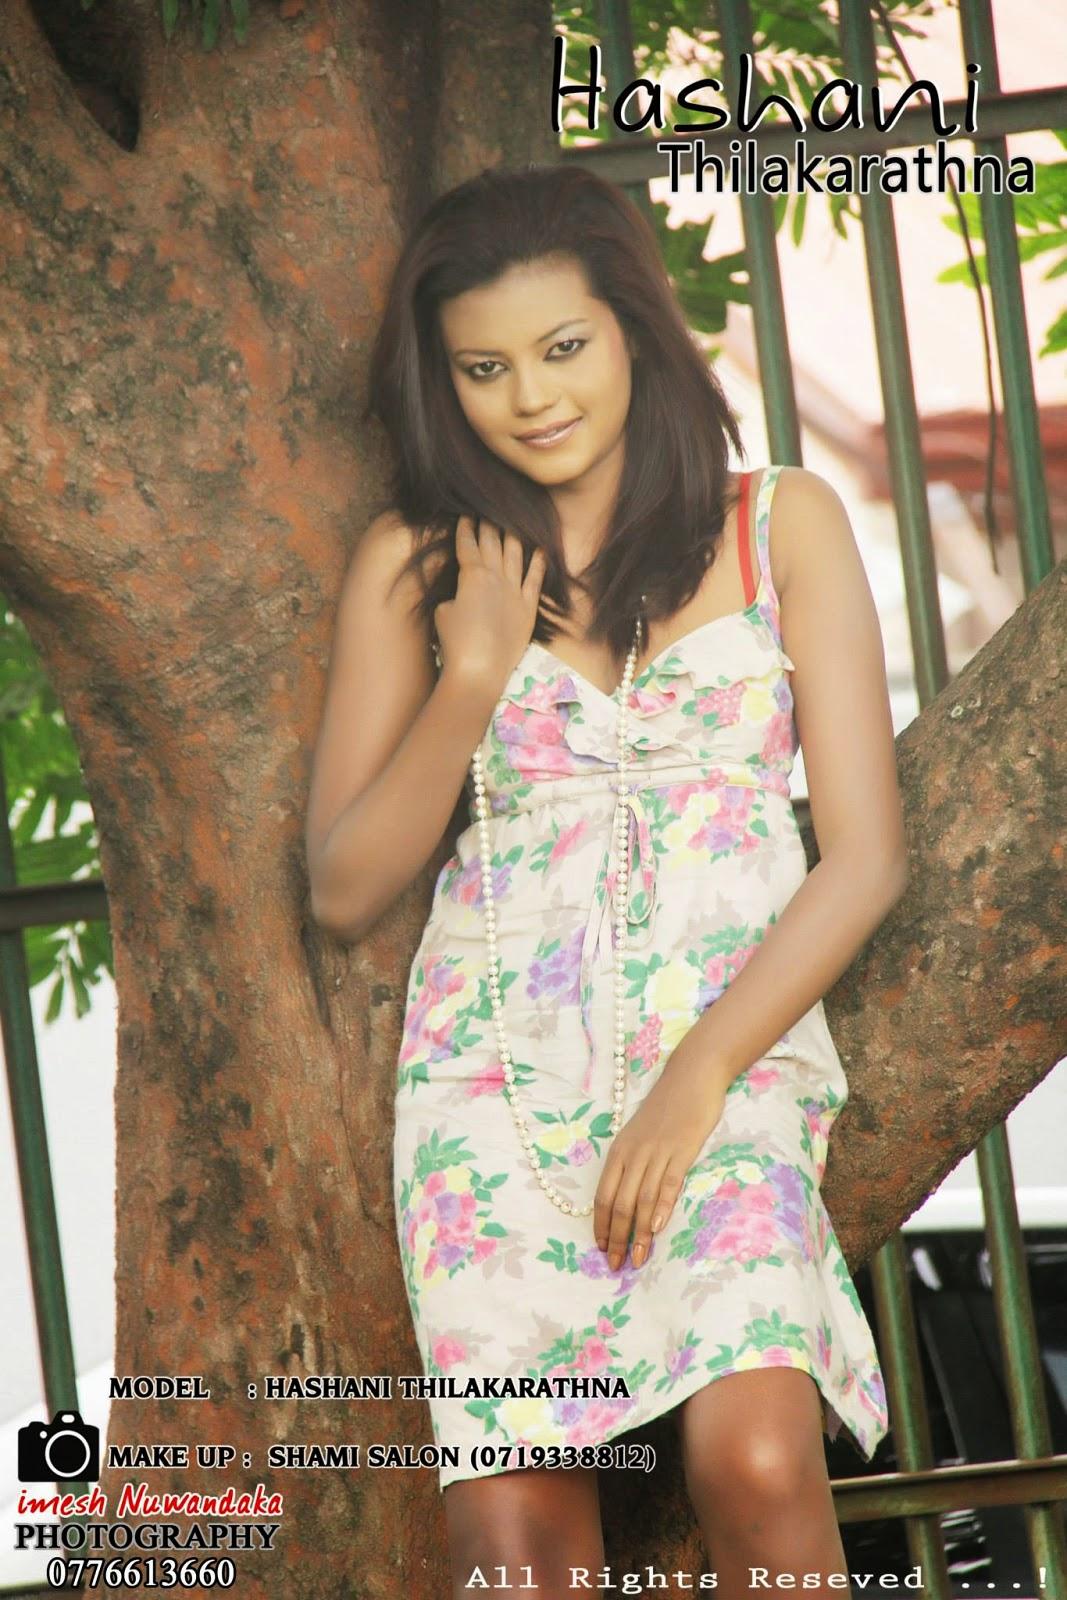 Hashani Thilakarathna hot